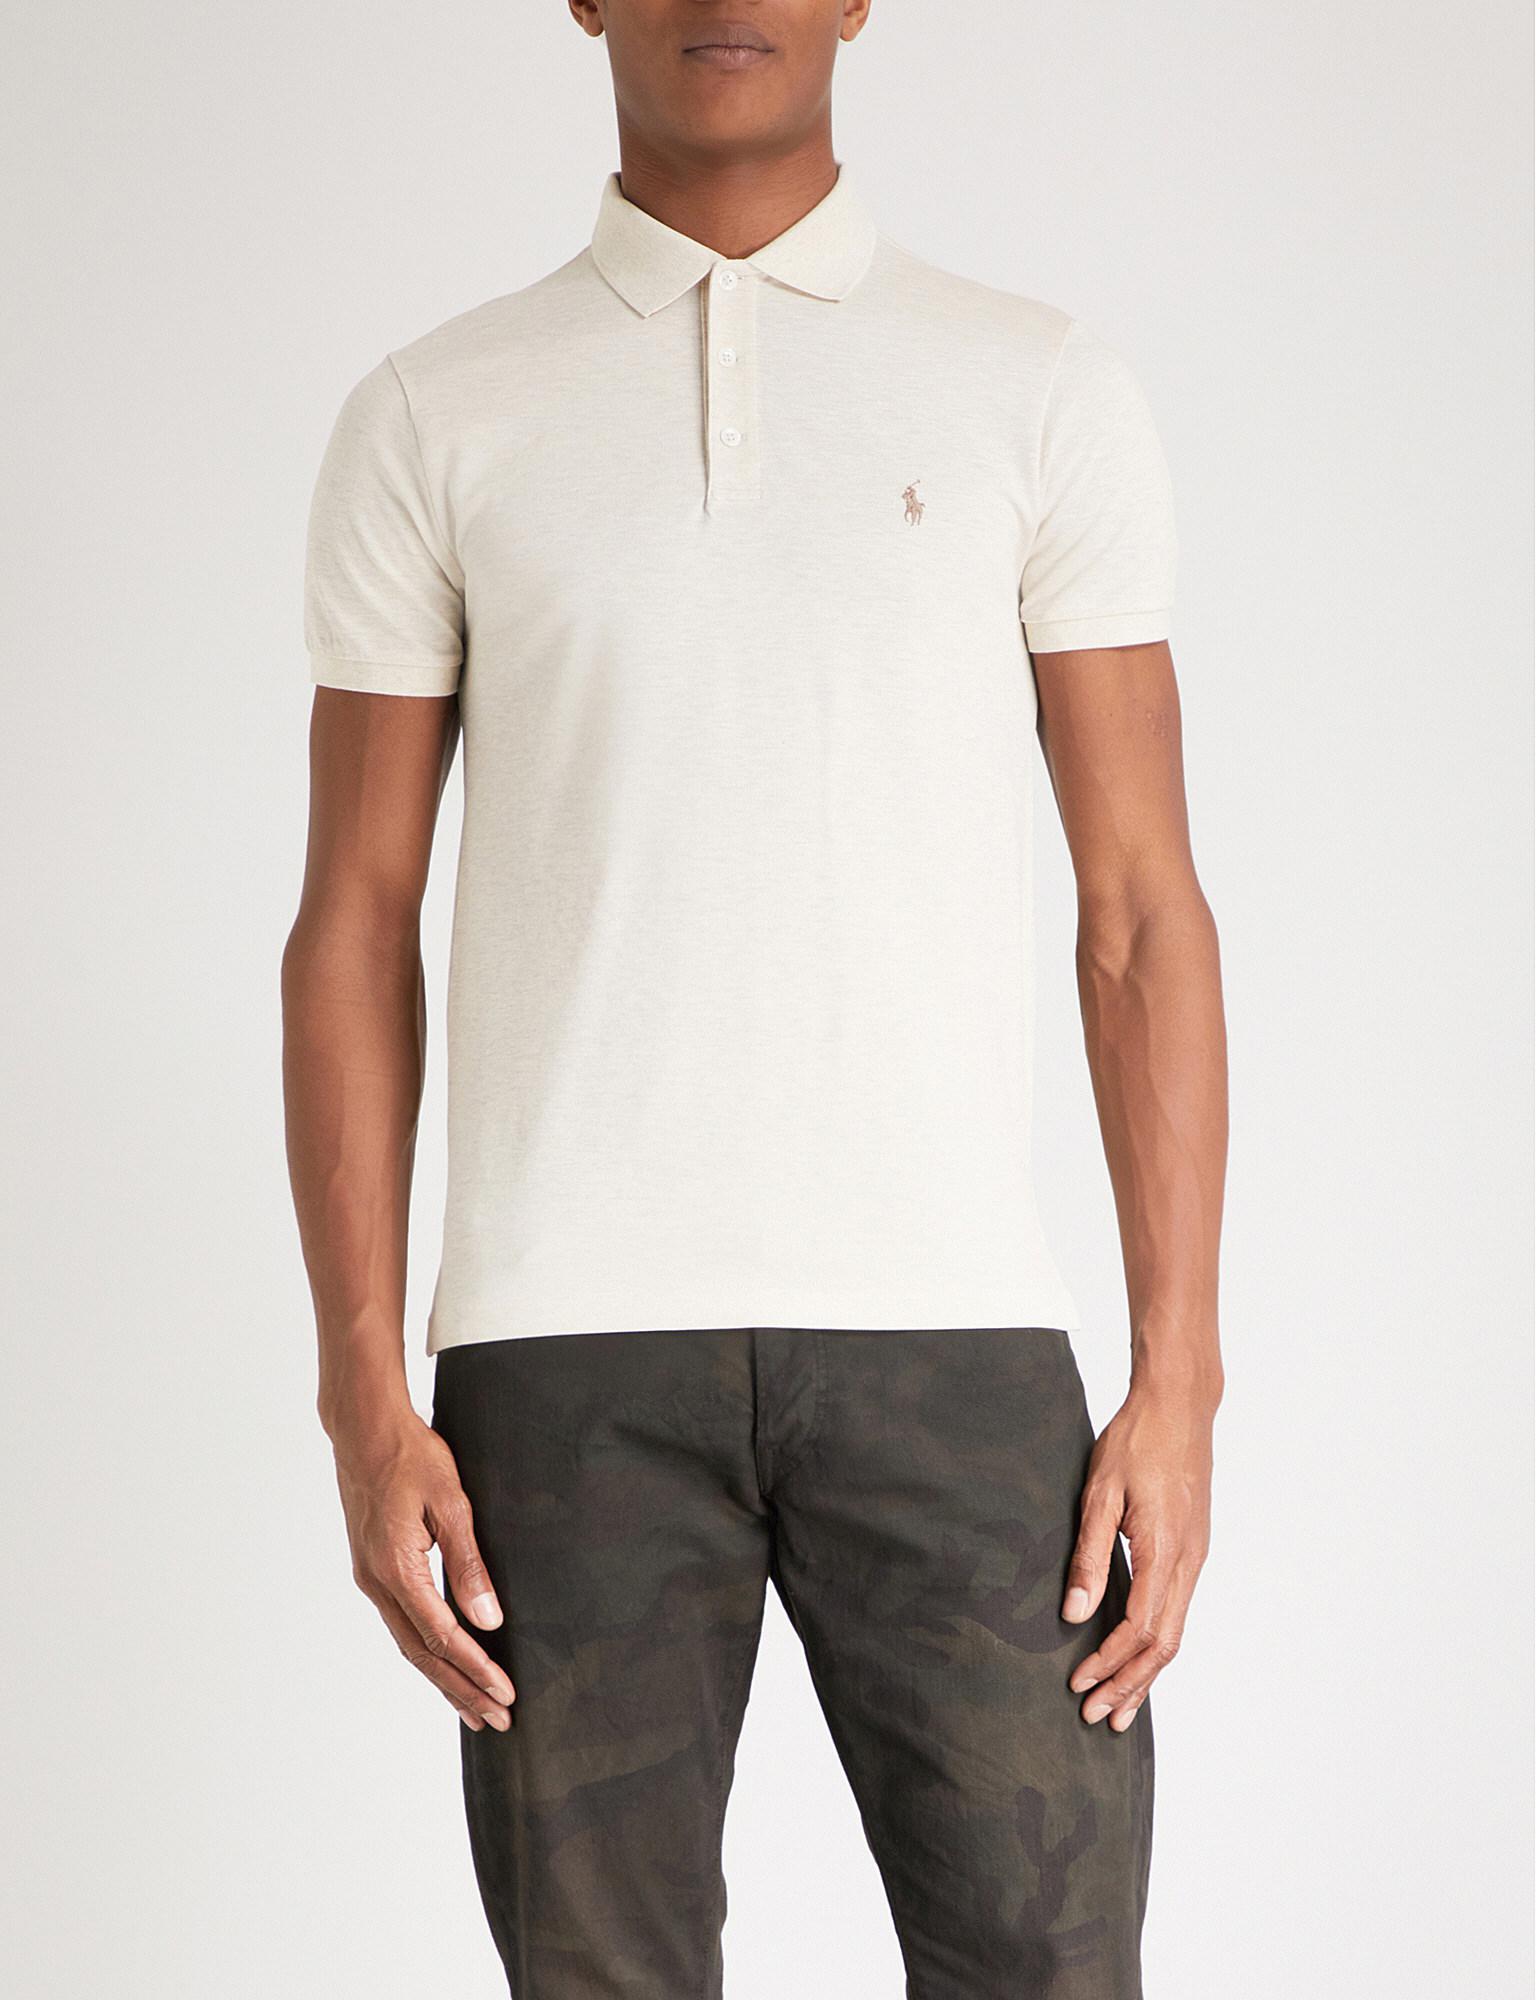 Slim-fit Pima Cotton-jersey Polo Shirt Polo Ralph Lauren Shop Offer For Sale 100% Guaranteed Cheap Online Buy Cheap Cheapest 040qWxXQ